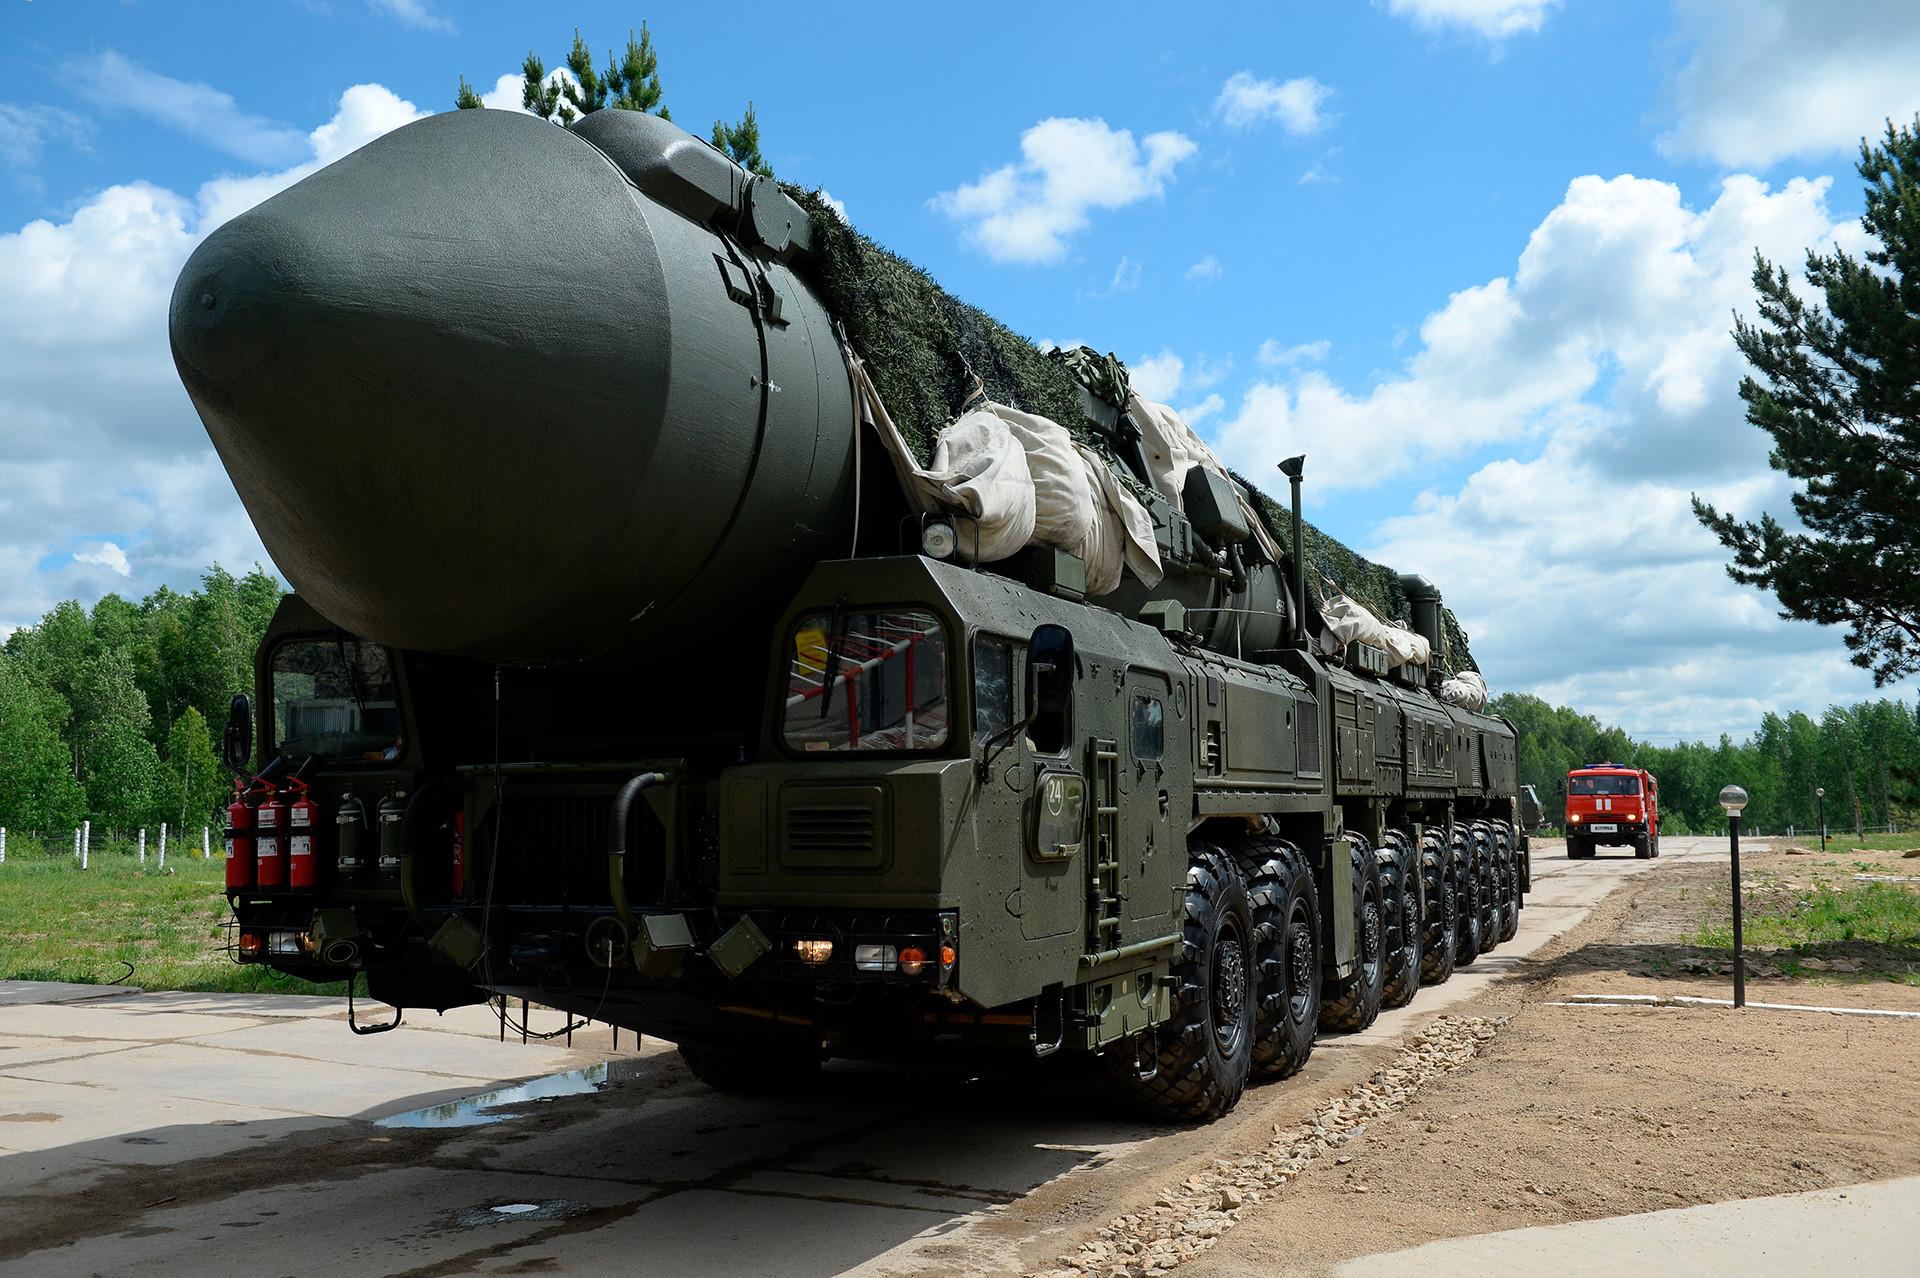 Misil balístico intercontinentale (ICBM) RS-24 'Yars'.